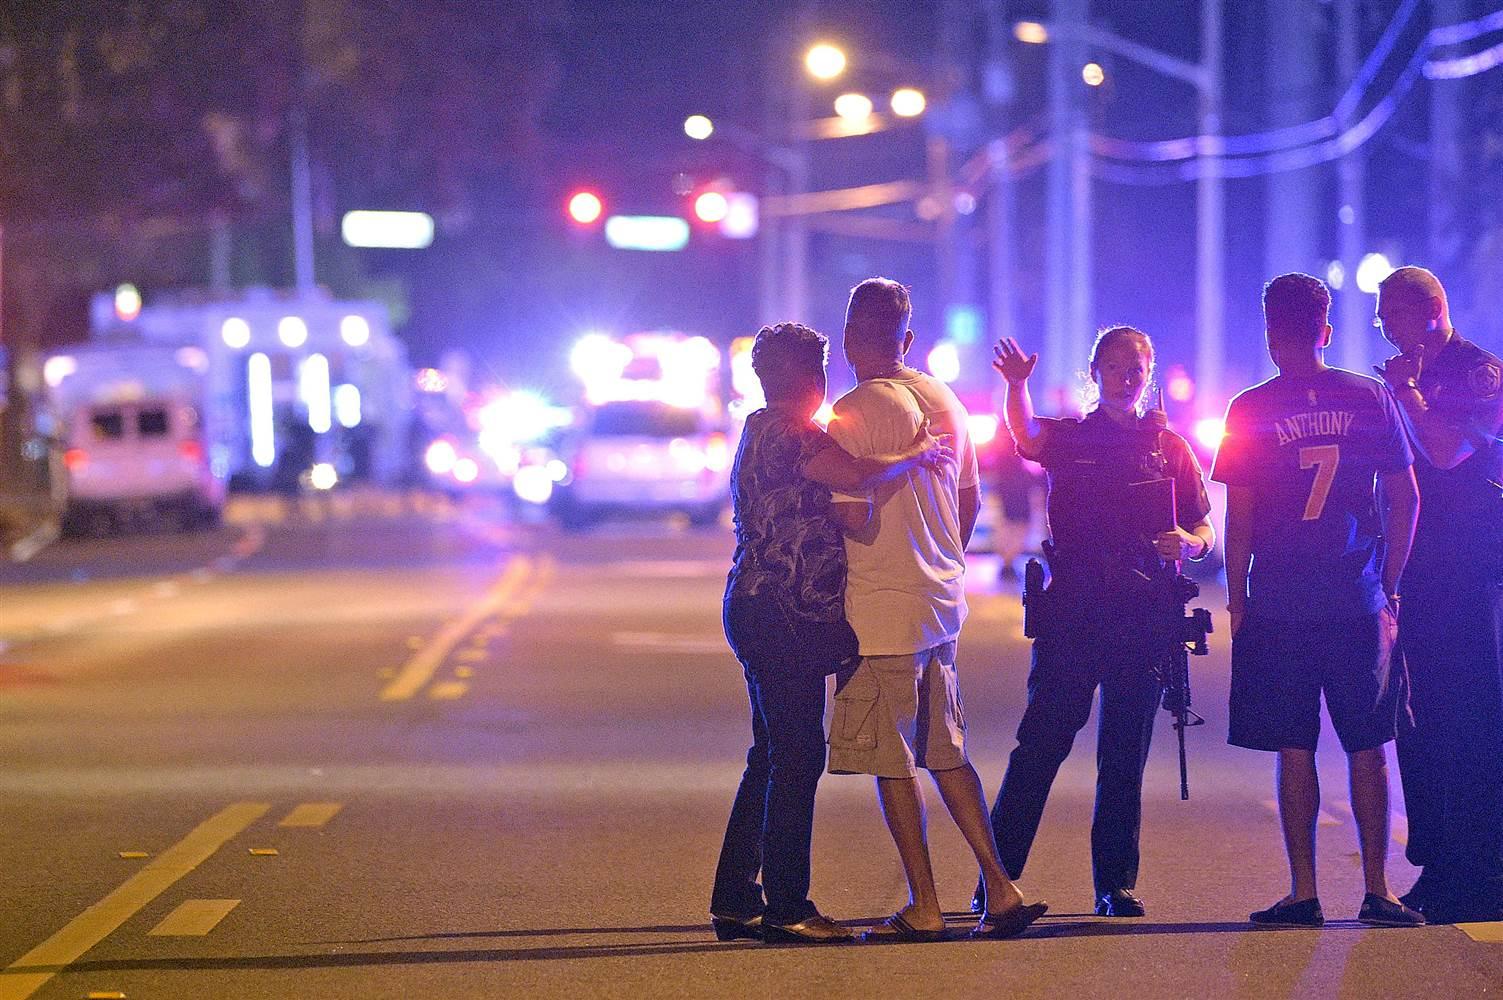 160612-orlando-nightclub-shootings-mn-0800_133a44c21926a9e9d50d0b1138e40586.nbcnews-ux-2880-1000